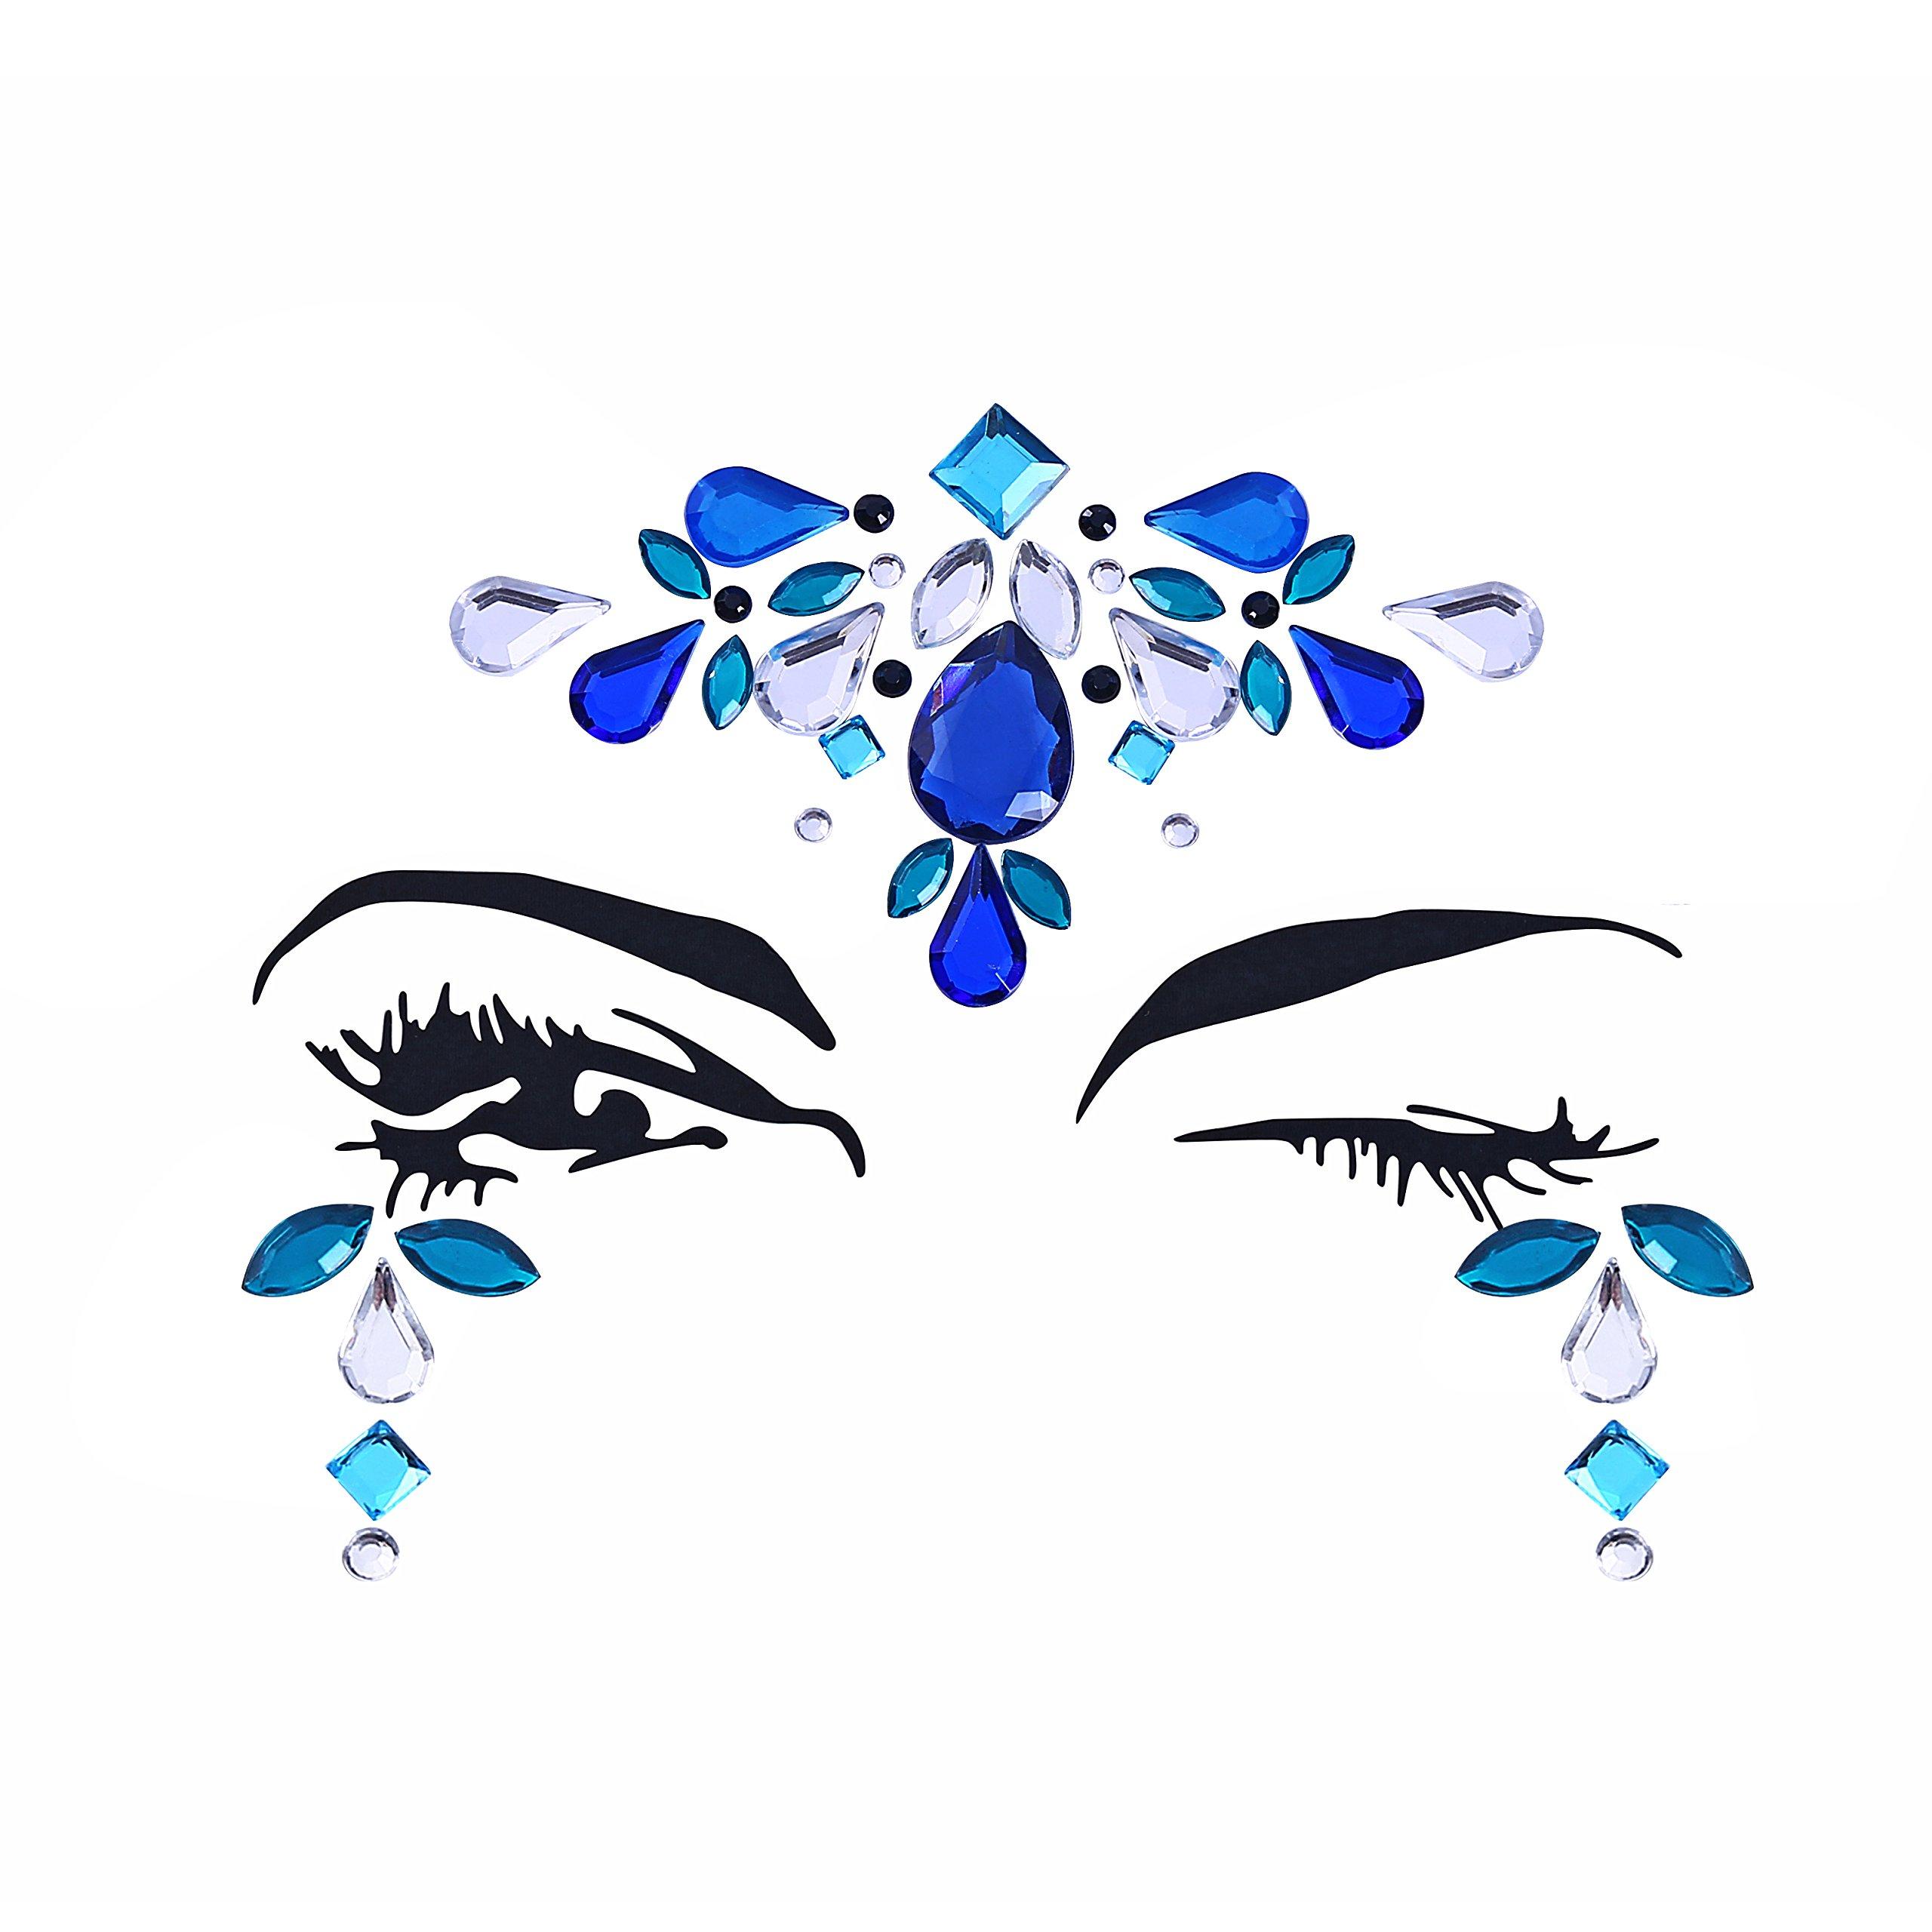 8 Sets Women Gems Glitter Rhinestone Mermaid Face Jewels Tattoo Crystal Tears Gem Stones Bindi Temporary Stickers by du fangbin (Image #5)